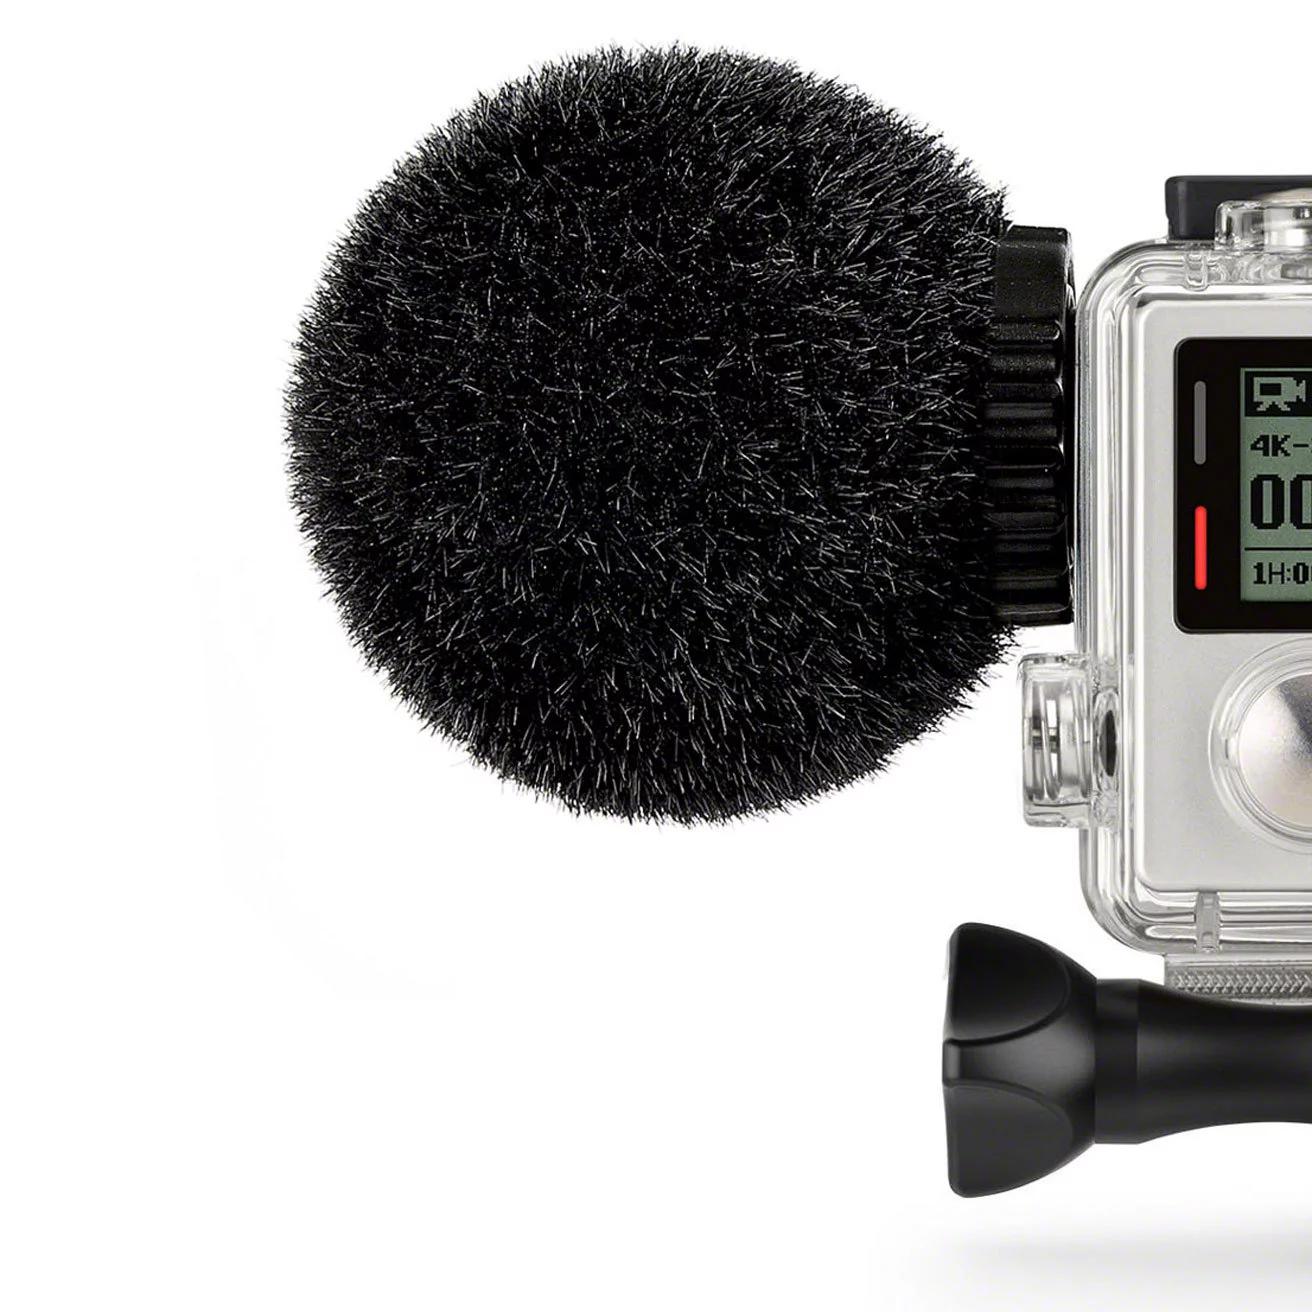 Sennheiser MKE 2 elements  waterproof microphone for GoPro® HERO4 cameras B-stock(1 year warranty), £14.95 at Sennheiser Outlet